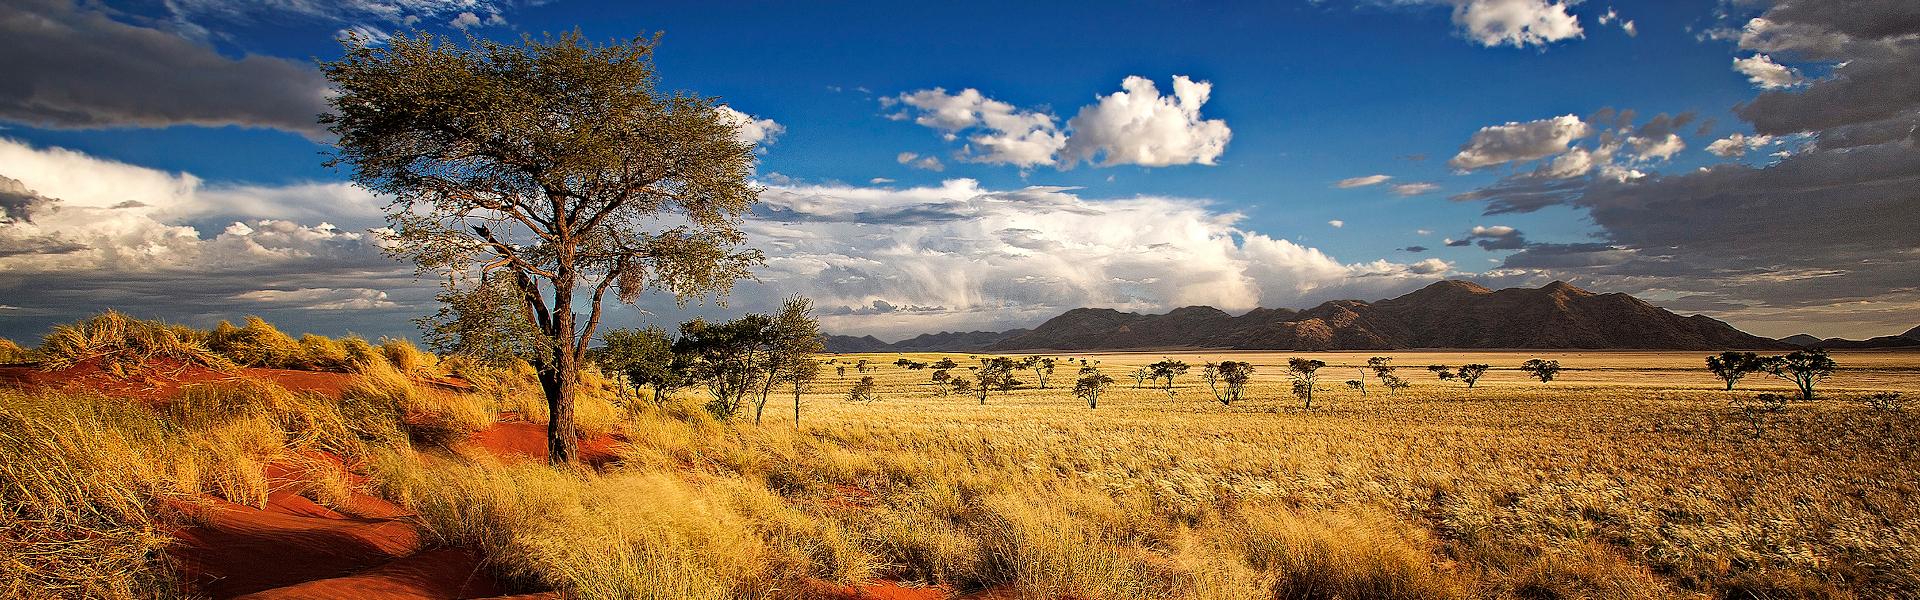 Namibia Privat & Exklusiv